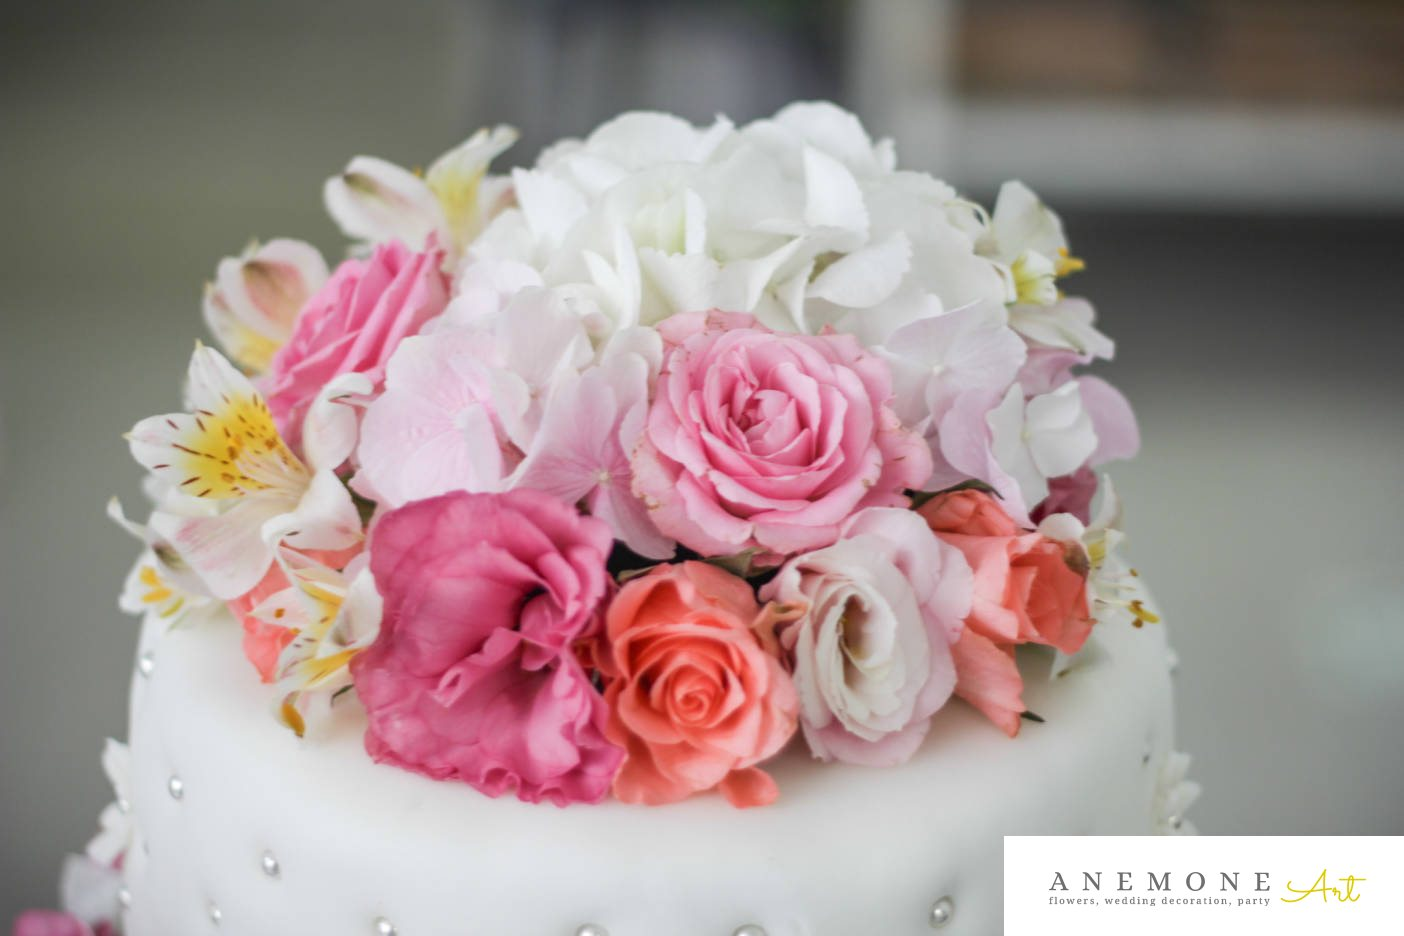 Poza, foto cu Flori de nunta alb, alstroemeria, decor tort, hortensia, lisianthus, roz, trandafiri in Arad, Timisoara, Oradea (wedding flowers, bouquets) nunta Arad, Timisoara, Oradea